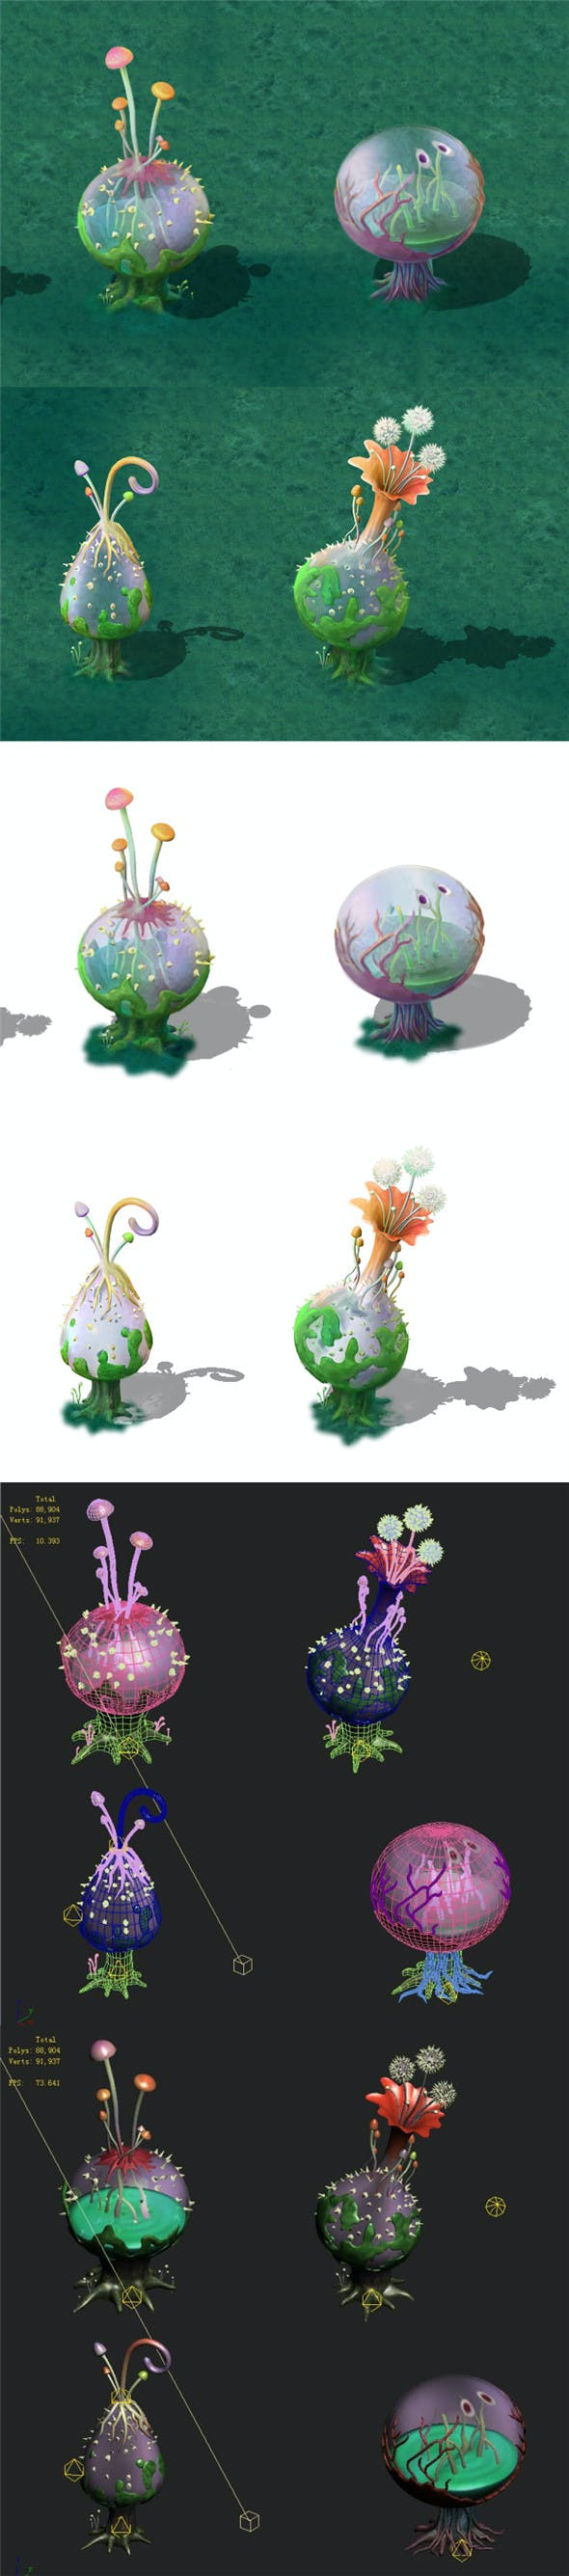 Cartoon version - hollow transparent spores - 3DOcean Item for Sale